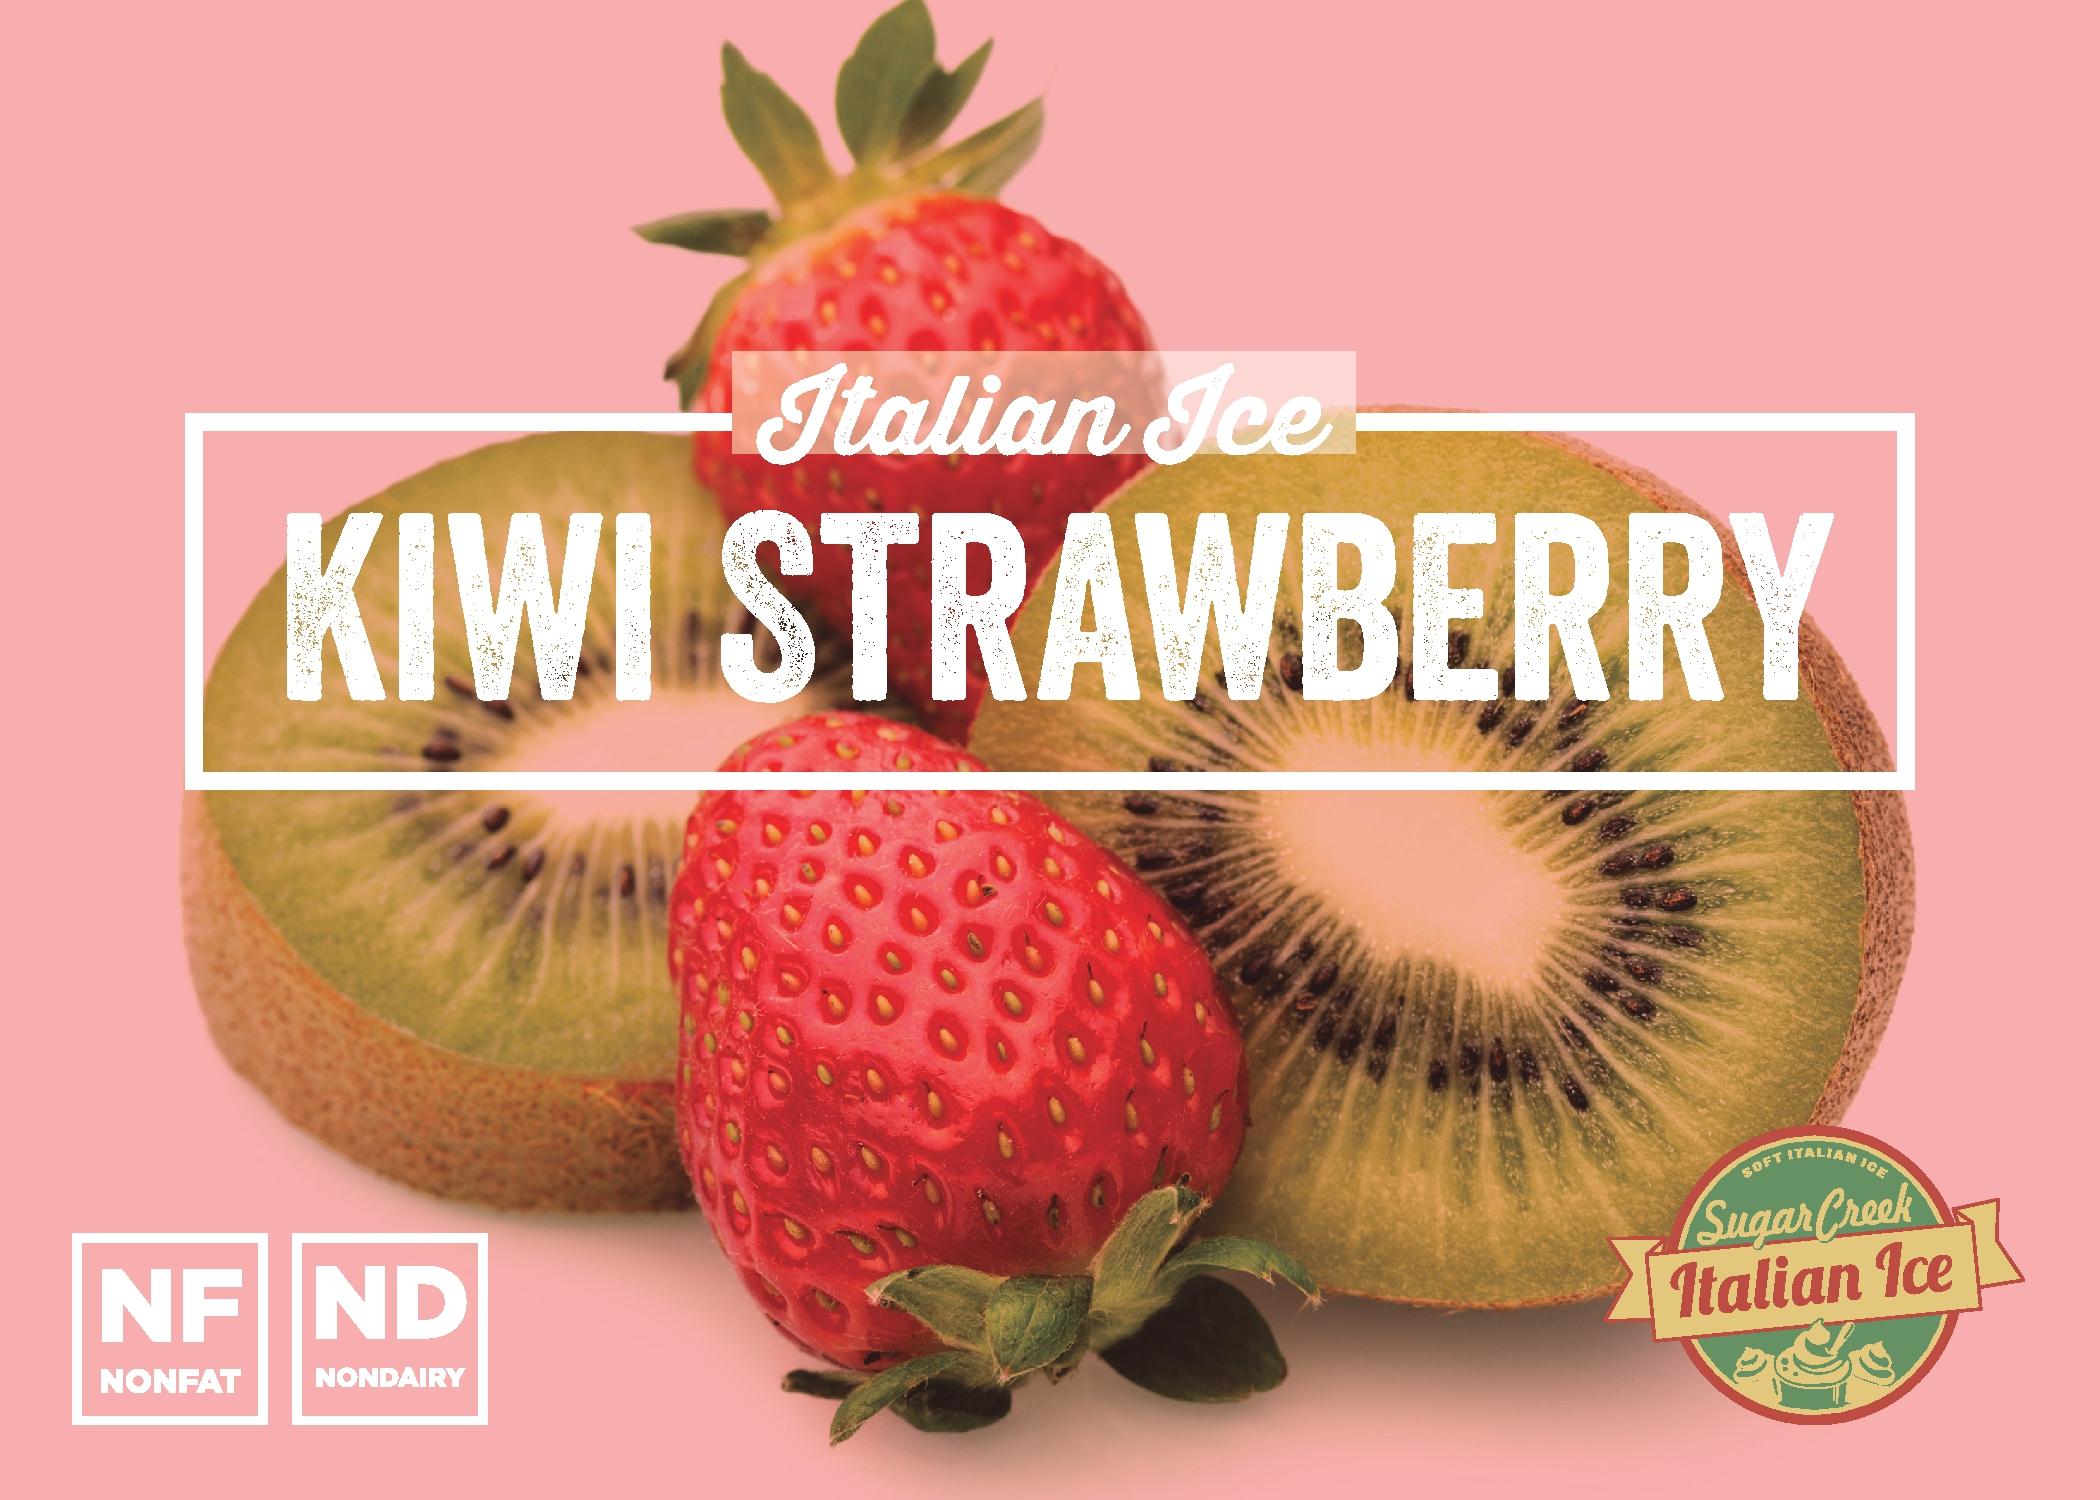 Kiwi Strawberry Italian Ice